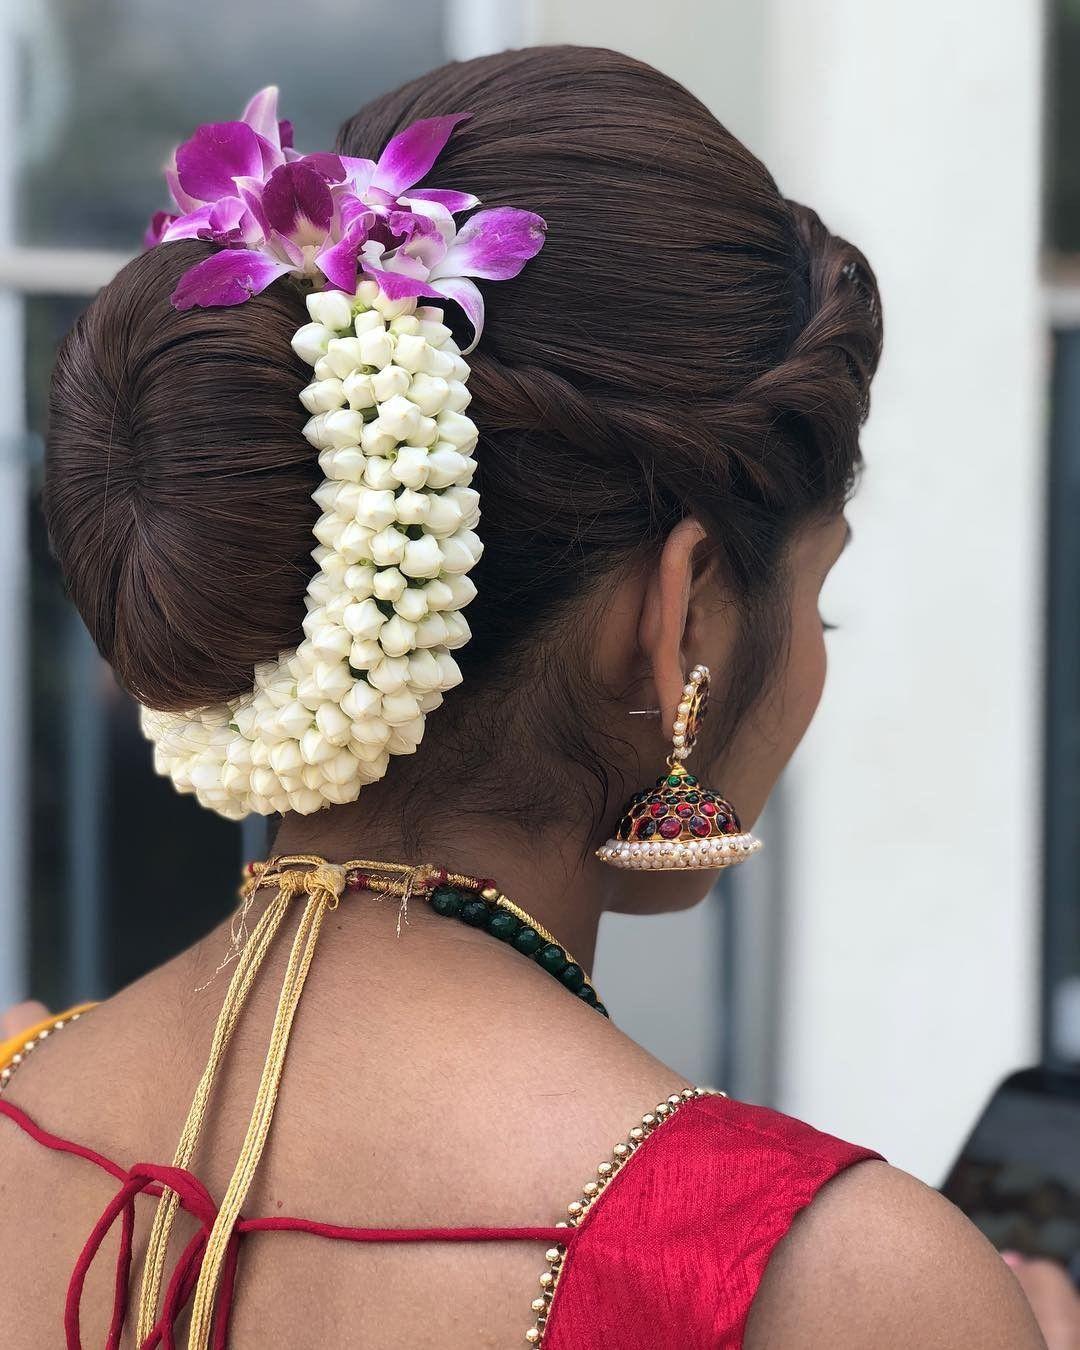 Hindu Bridal Hairstyles 14 Safe Hairdos For The Modern: Pin By Oyshirose On Donut Bun